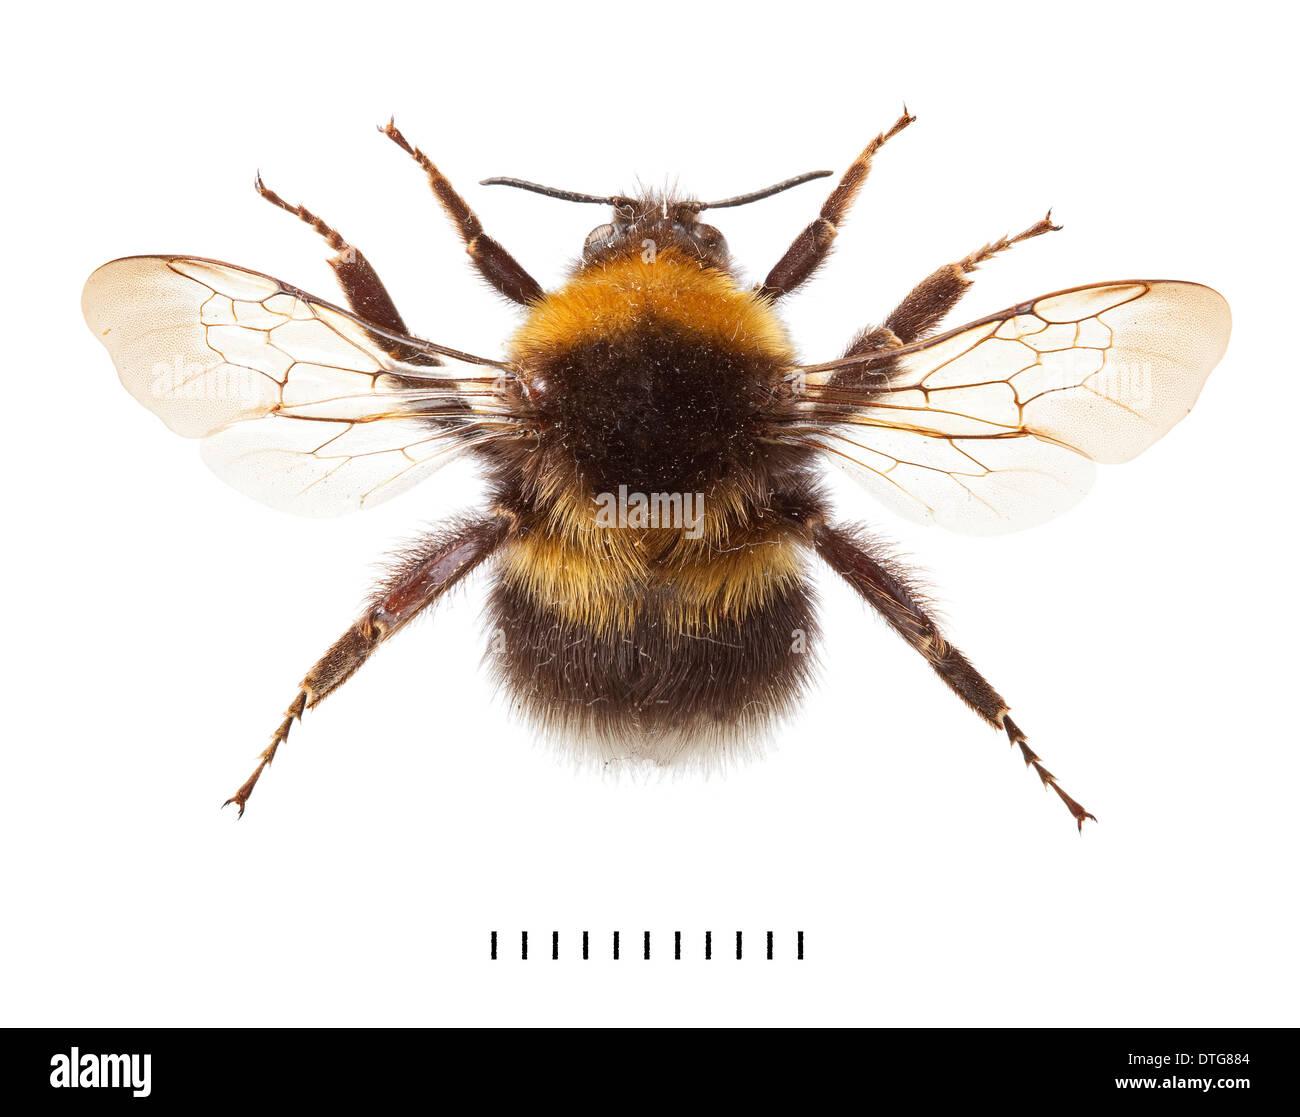 bombus hortorum garden bumblebee stock photo royalty free image